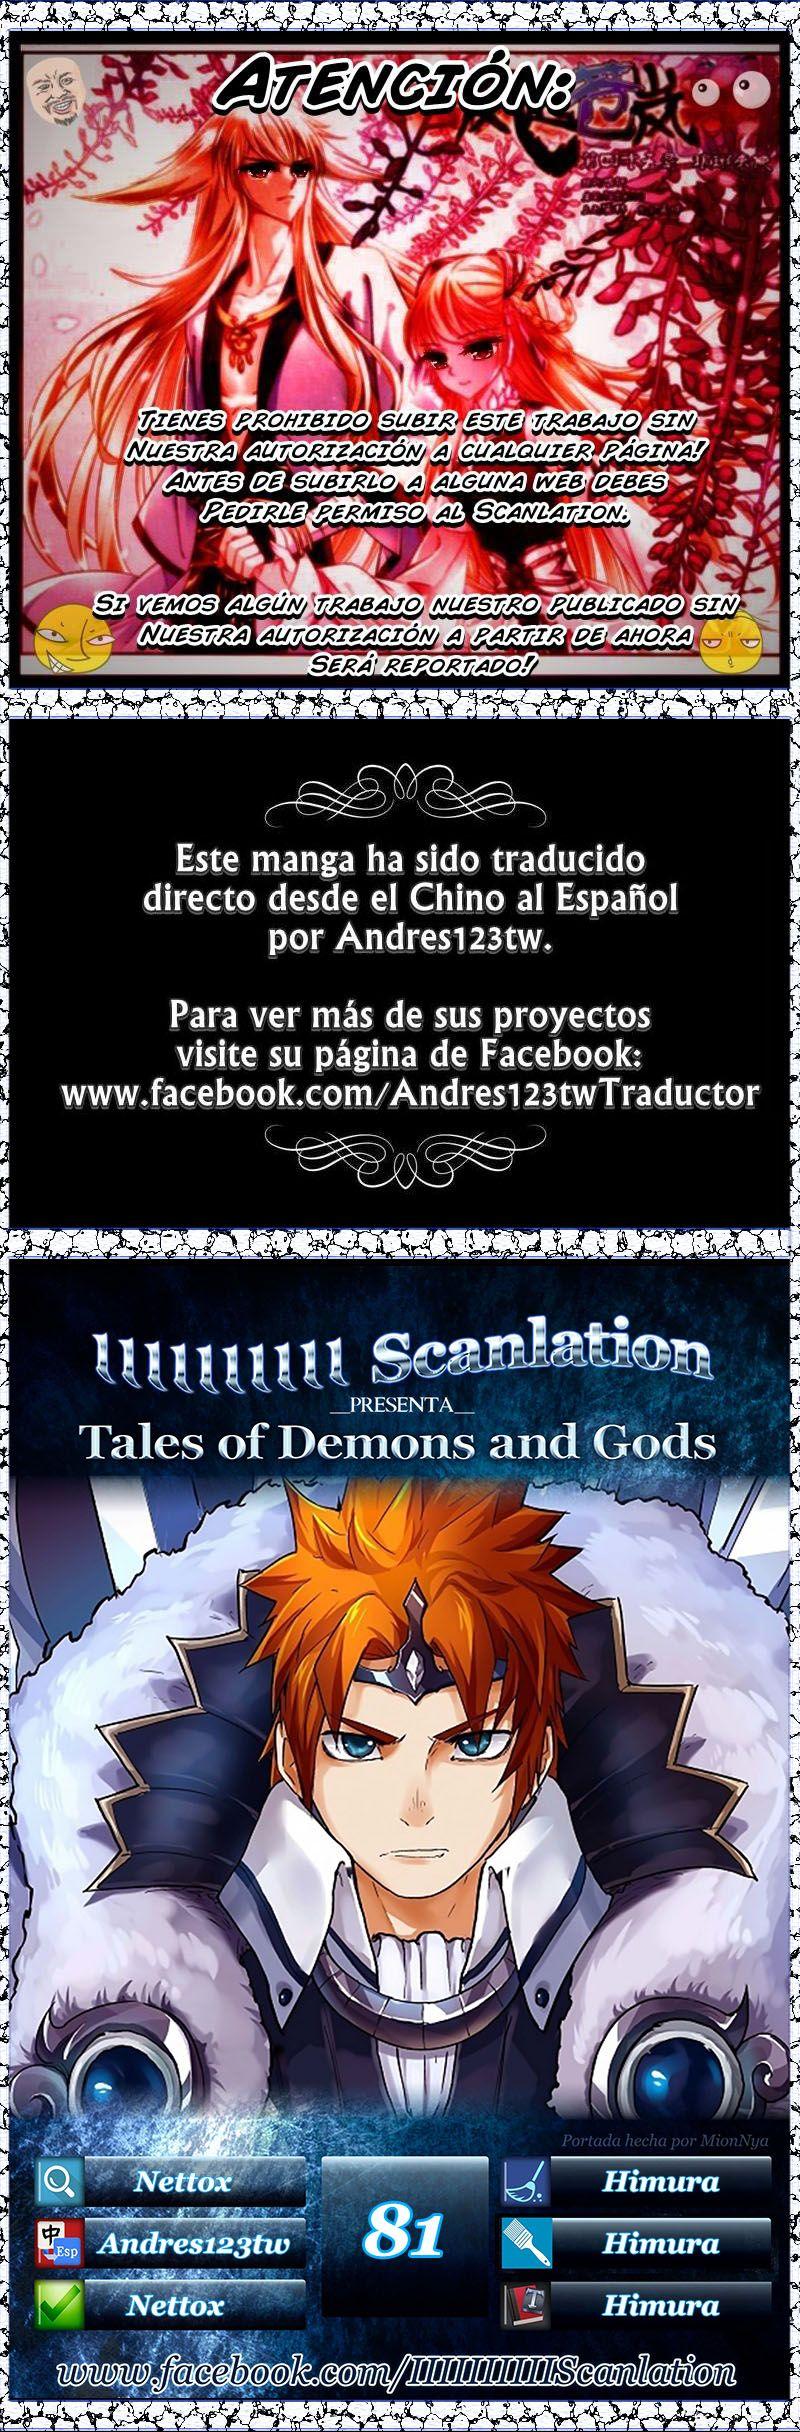 http://c5.ninemanga.com/es_manga/7/17735/463723/8412f42034af852f237e3af8209f3a6f.jpg Page 1